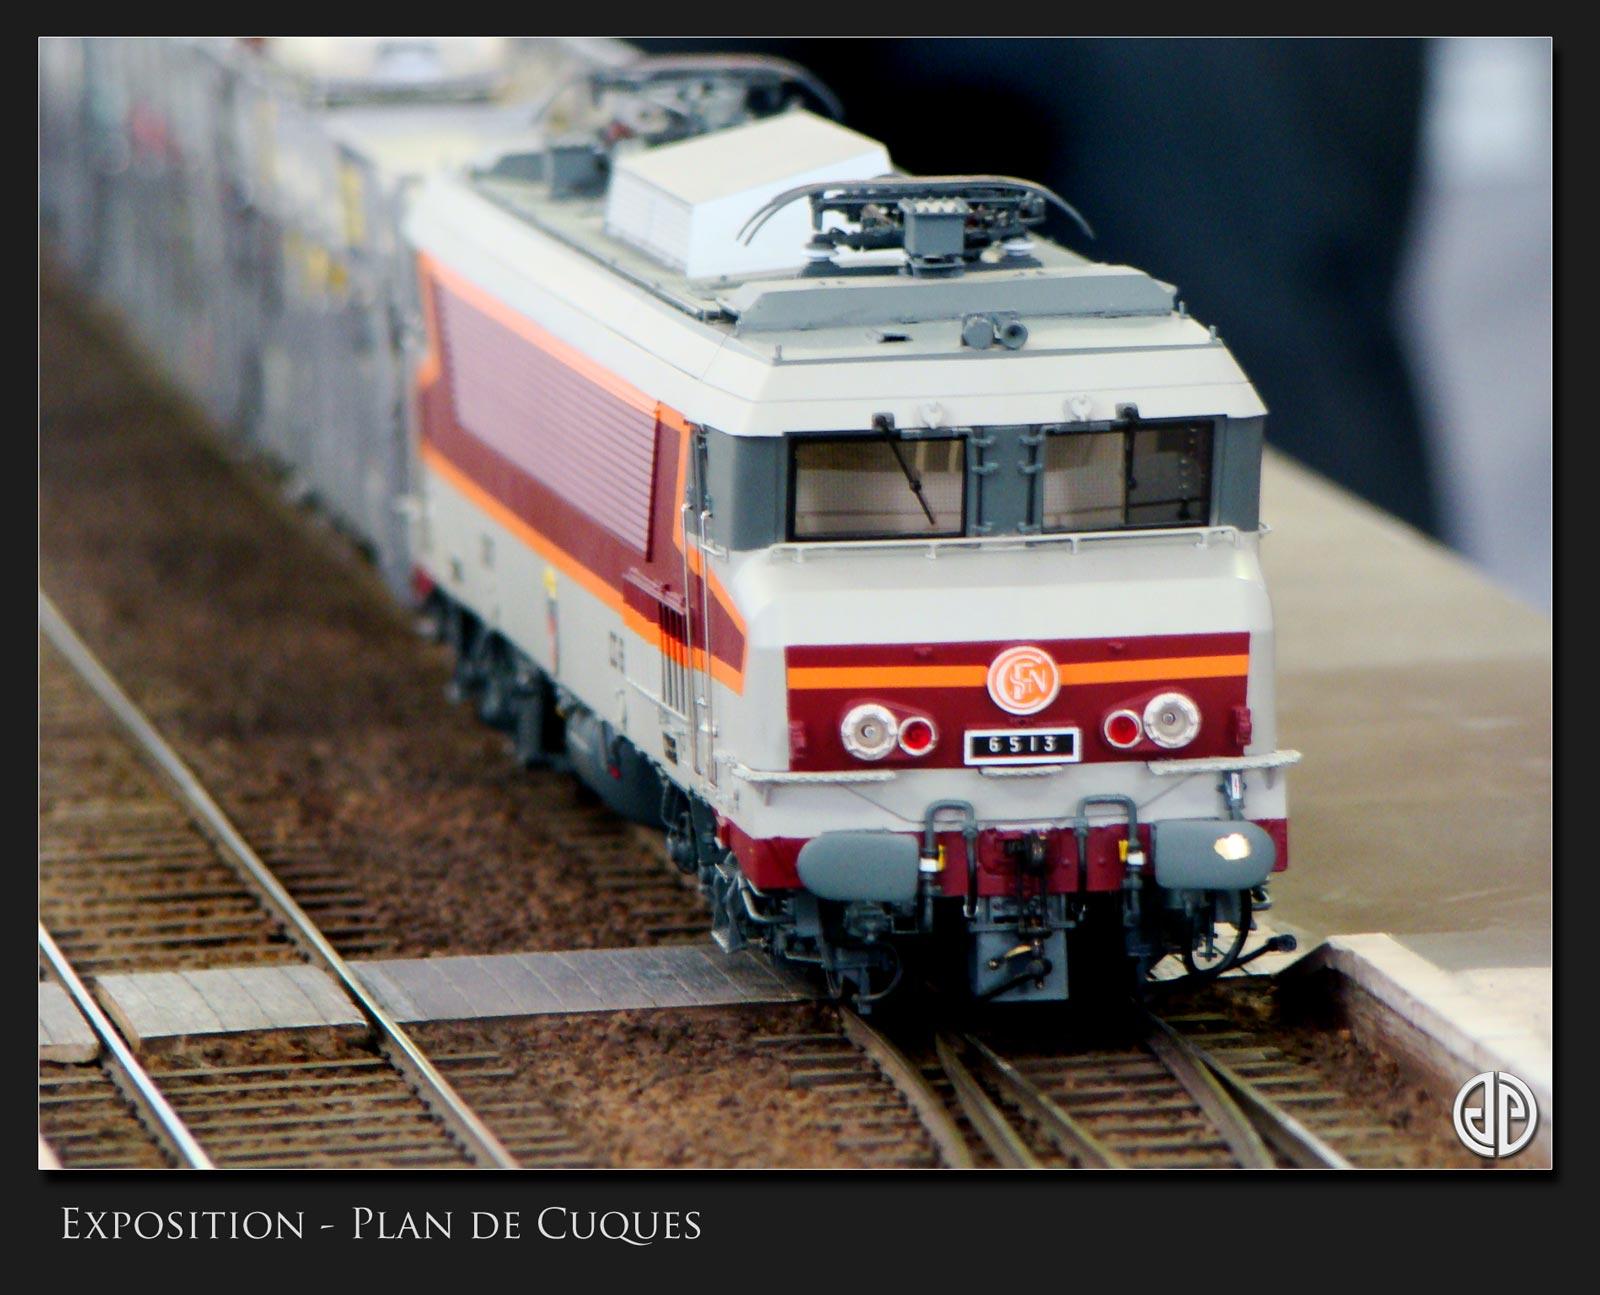 Expo-ferroviaire-Plan-de-Cuques-06